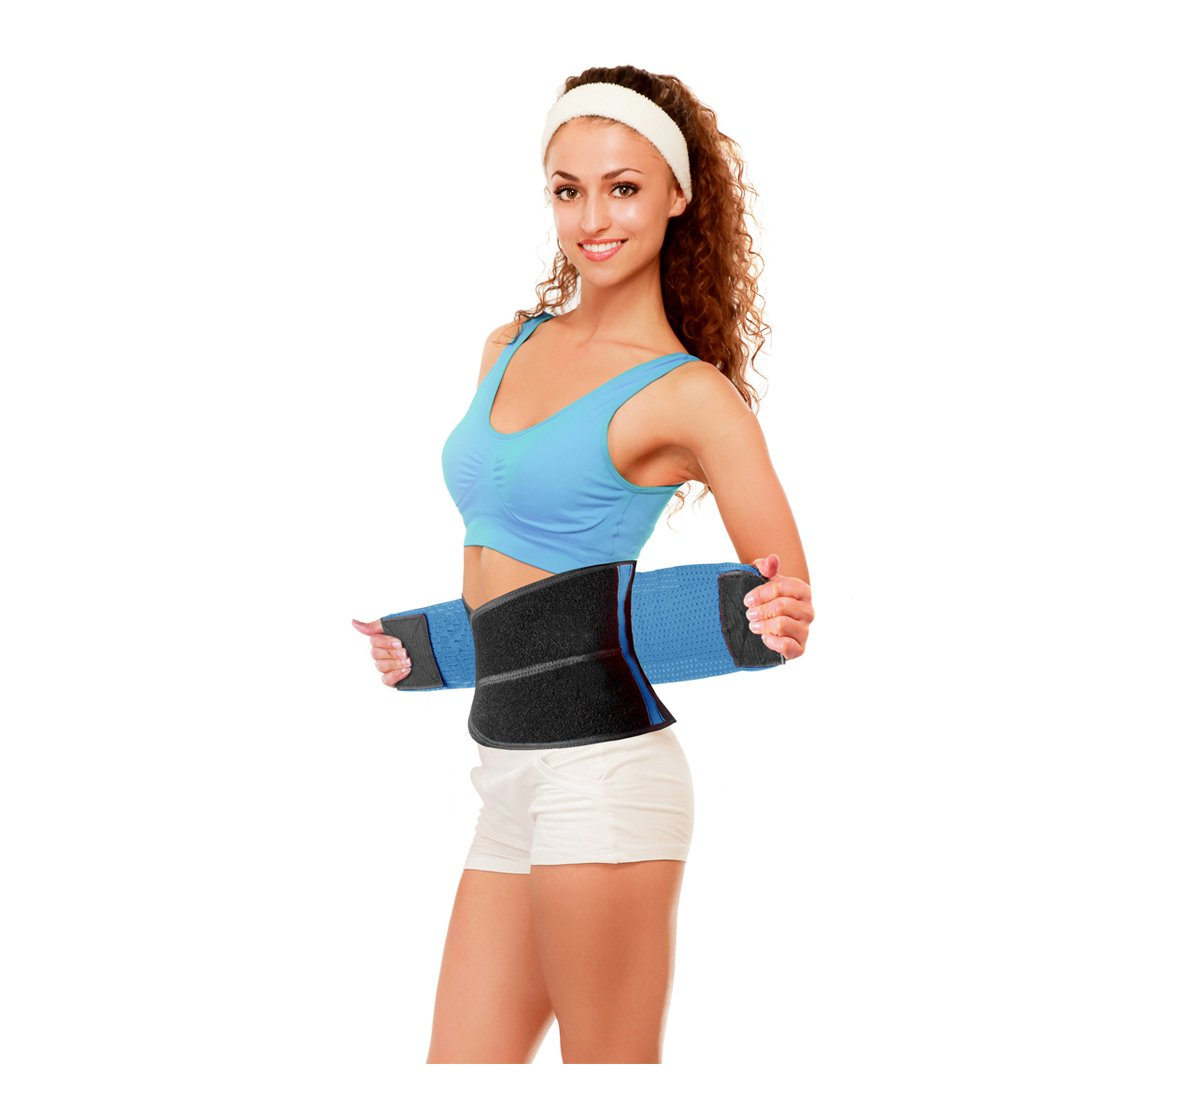 PU Health Mma Fighter Waist Support Adjustable Compression Belt by German Physicians, Black